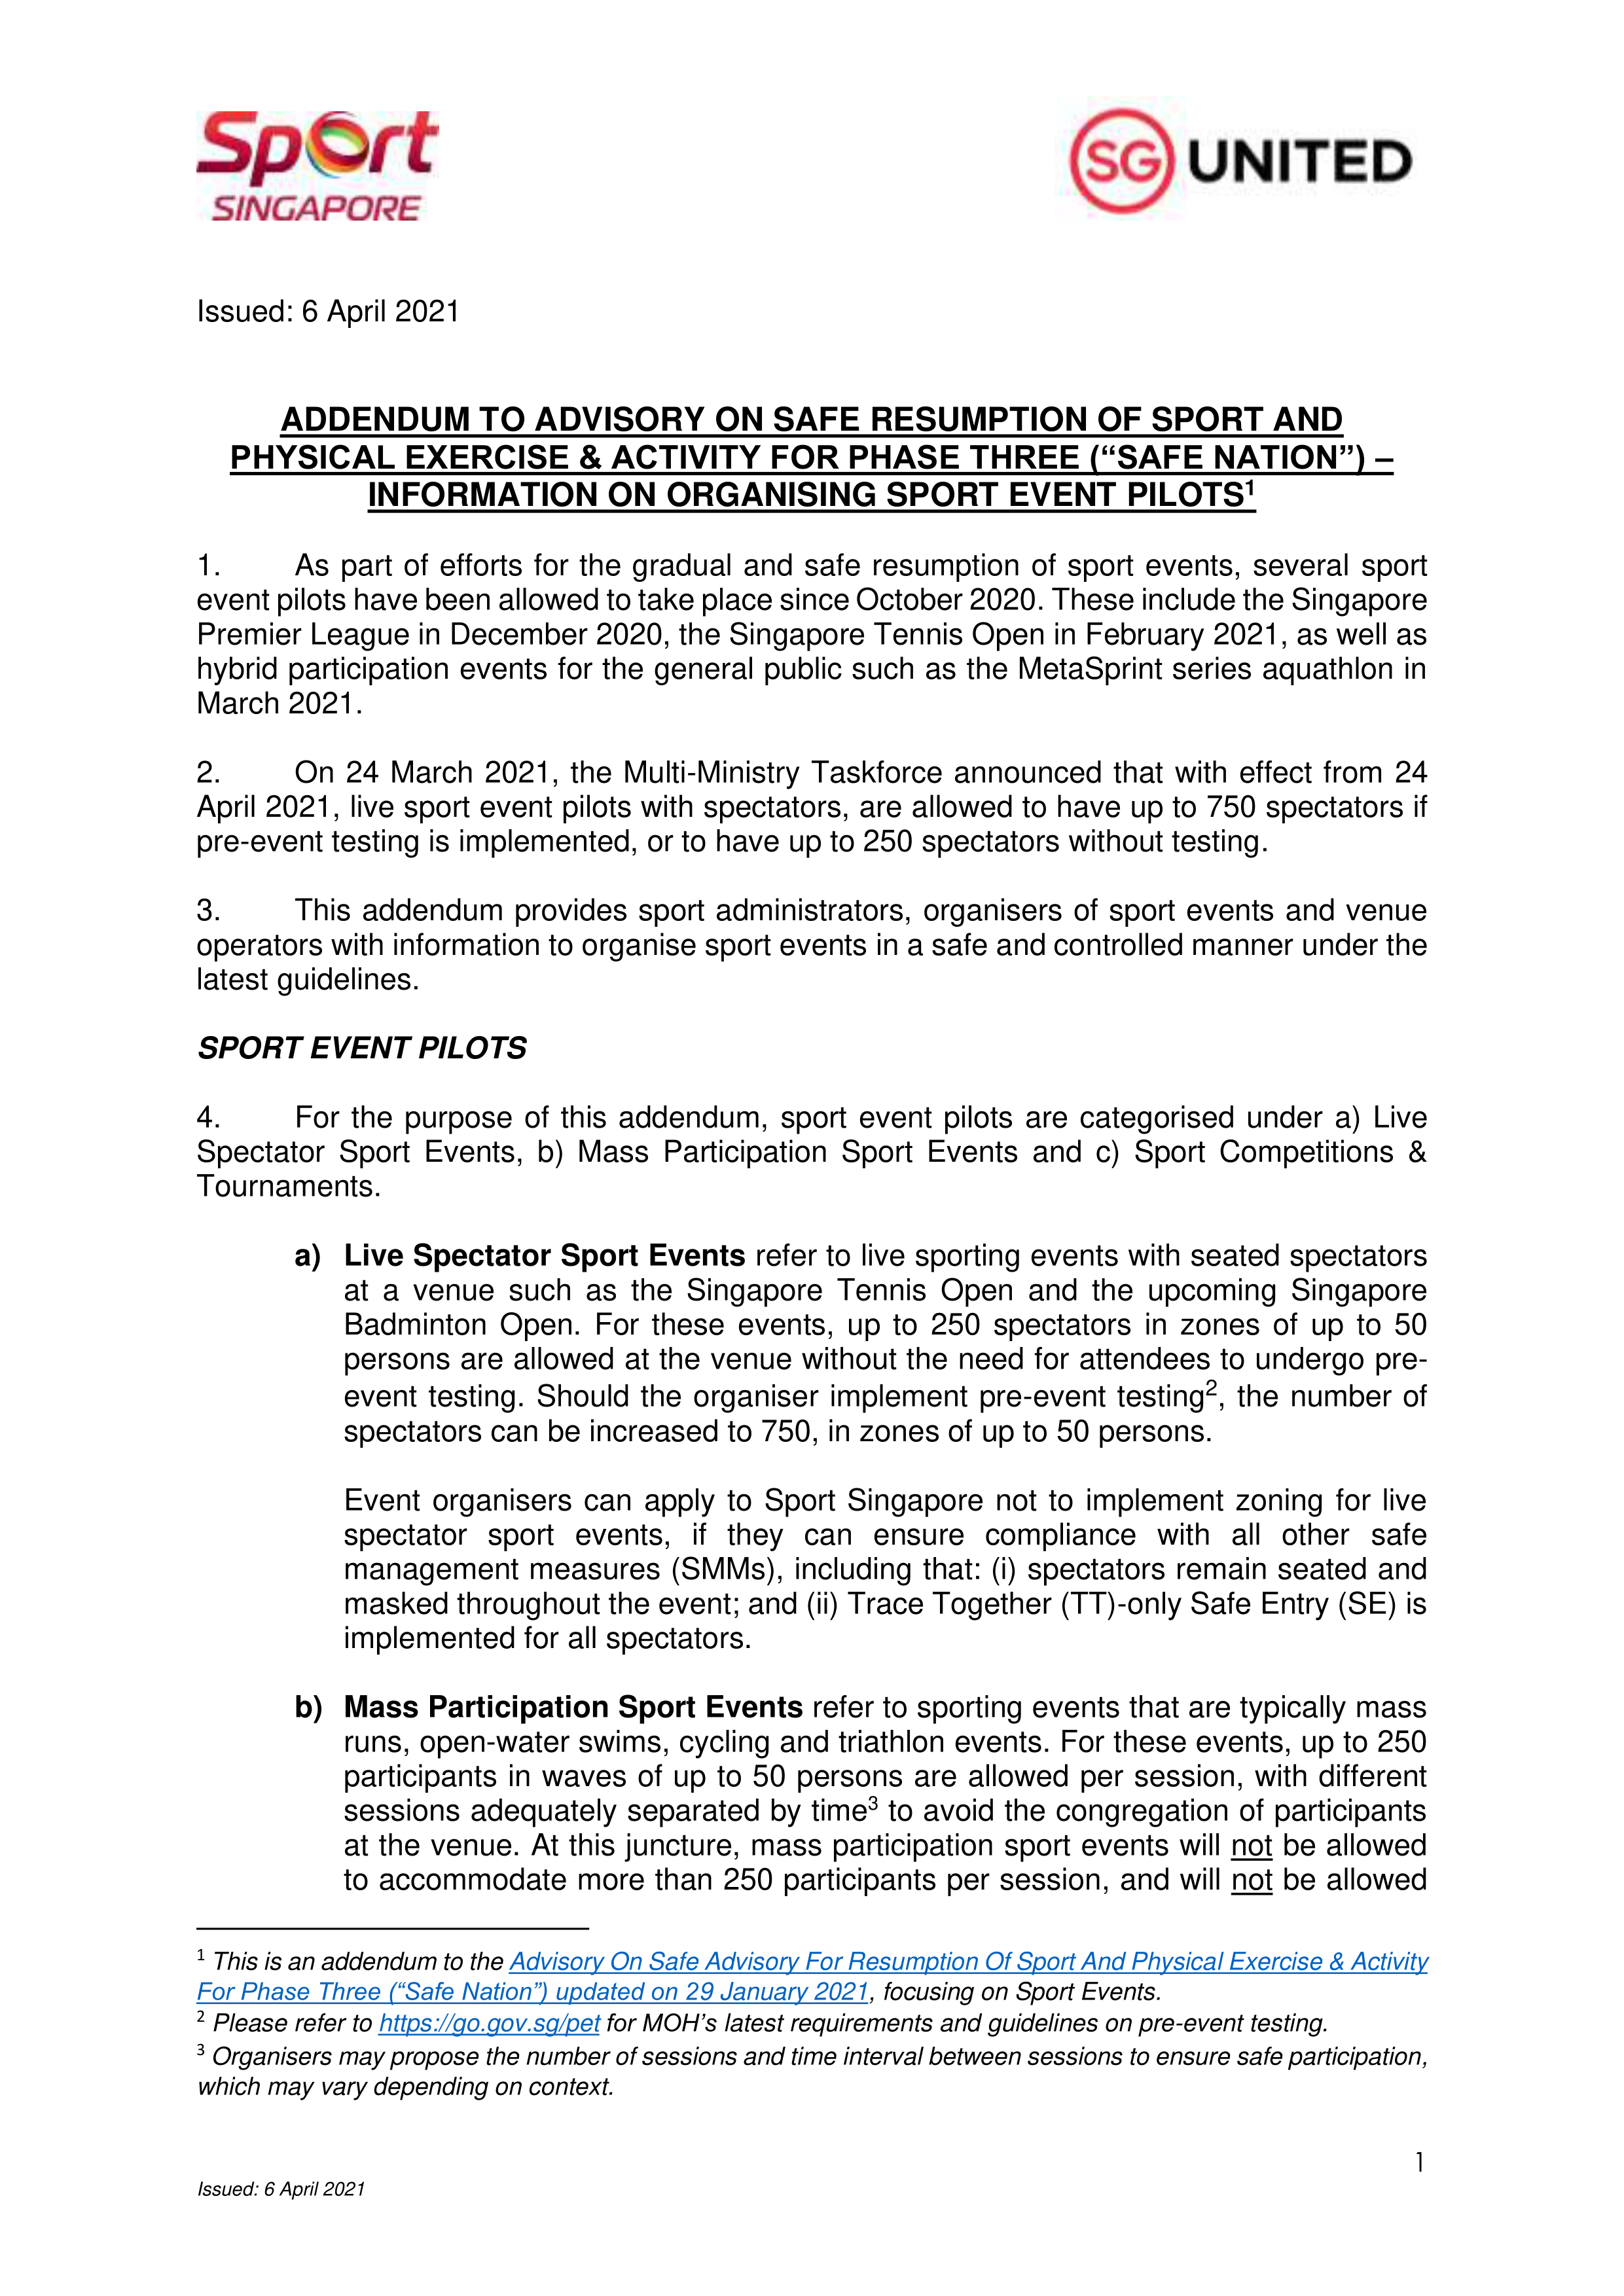 Addendum to Advisory_Info on Sport Event Pilots copy